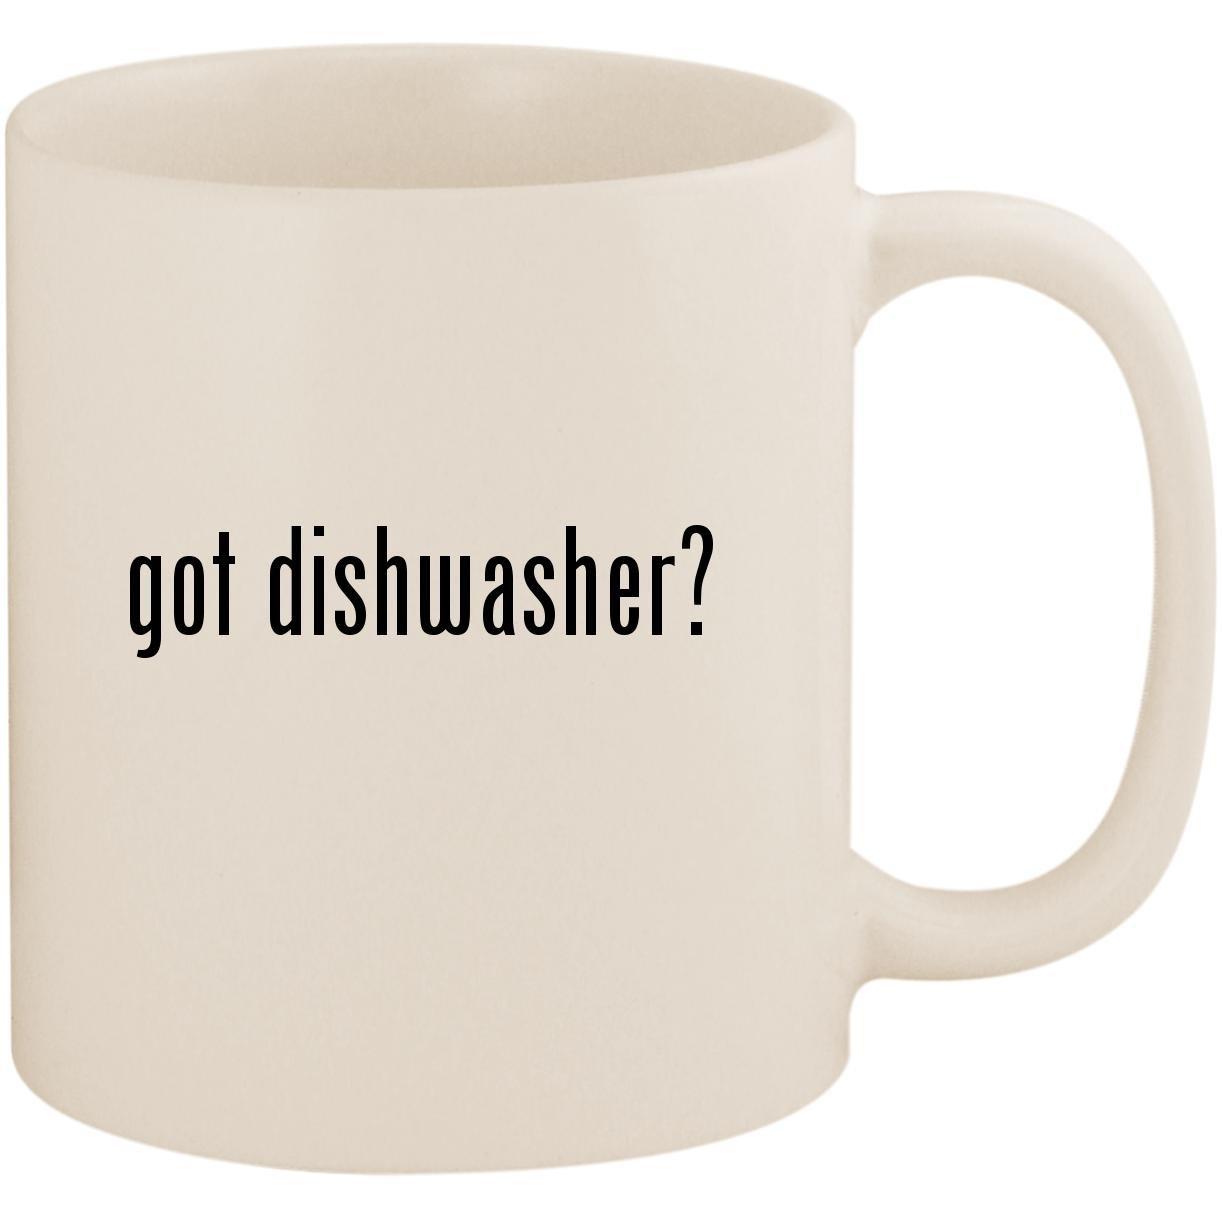 got dishwasher? - 11oz Ceramic White Coffee Mug Cup, White